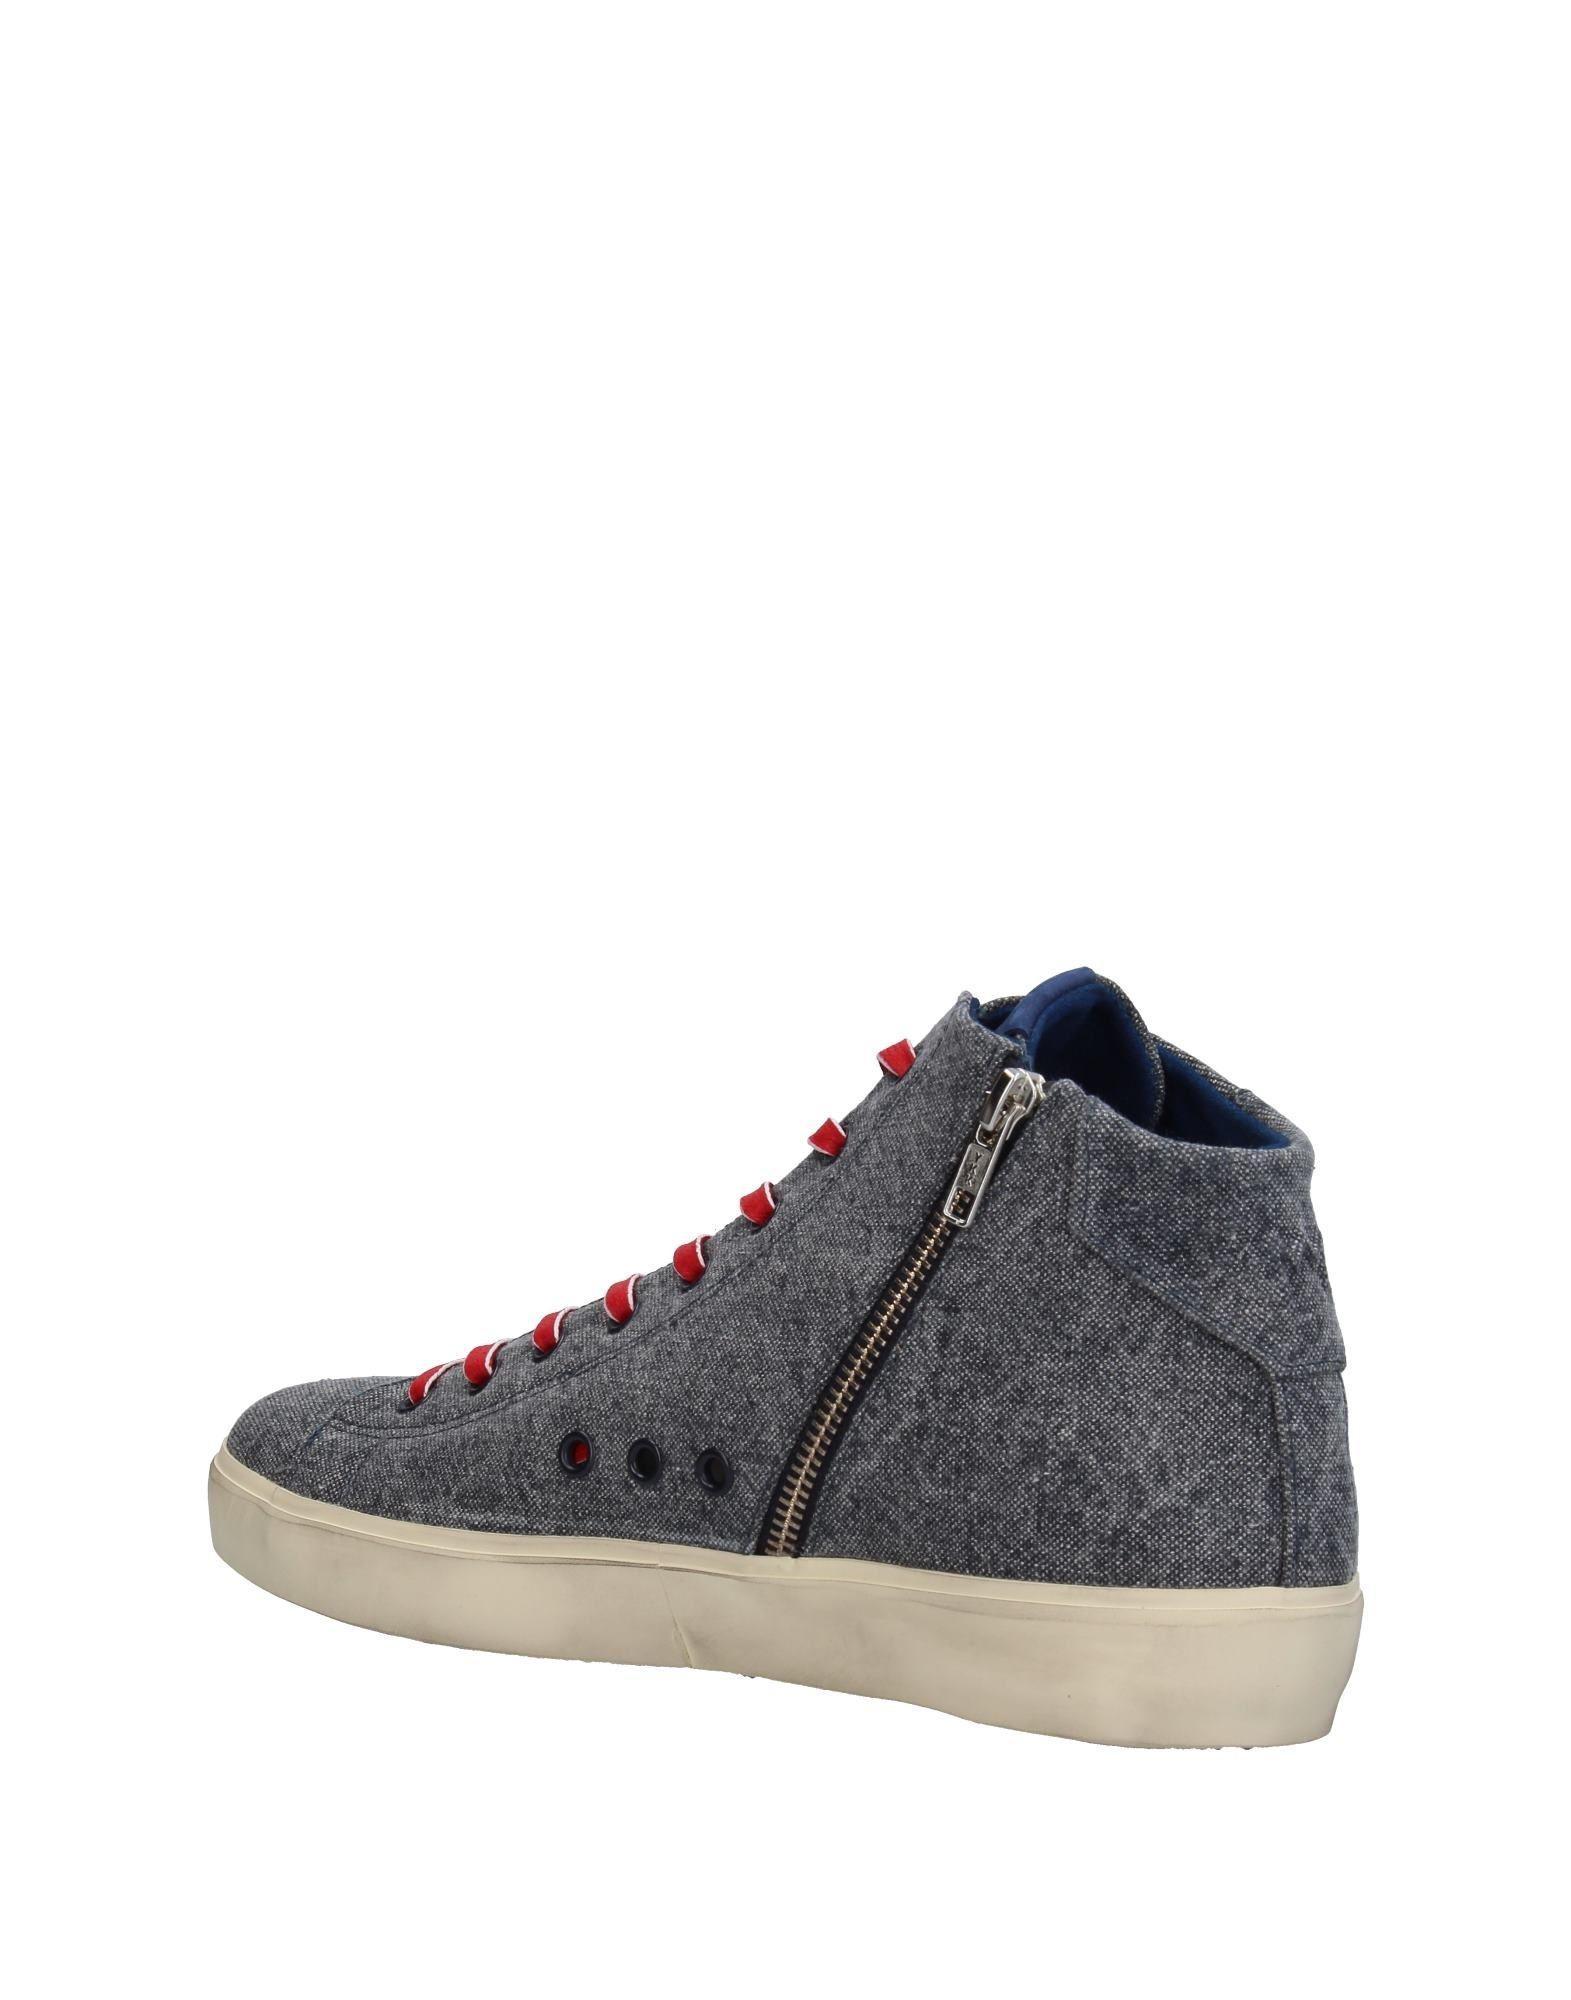 Sneakers abotinadas Leather Crown de hombre